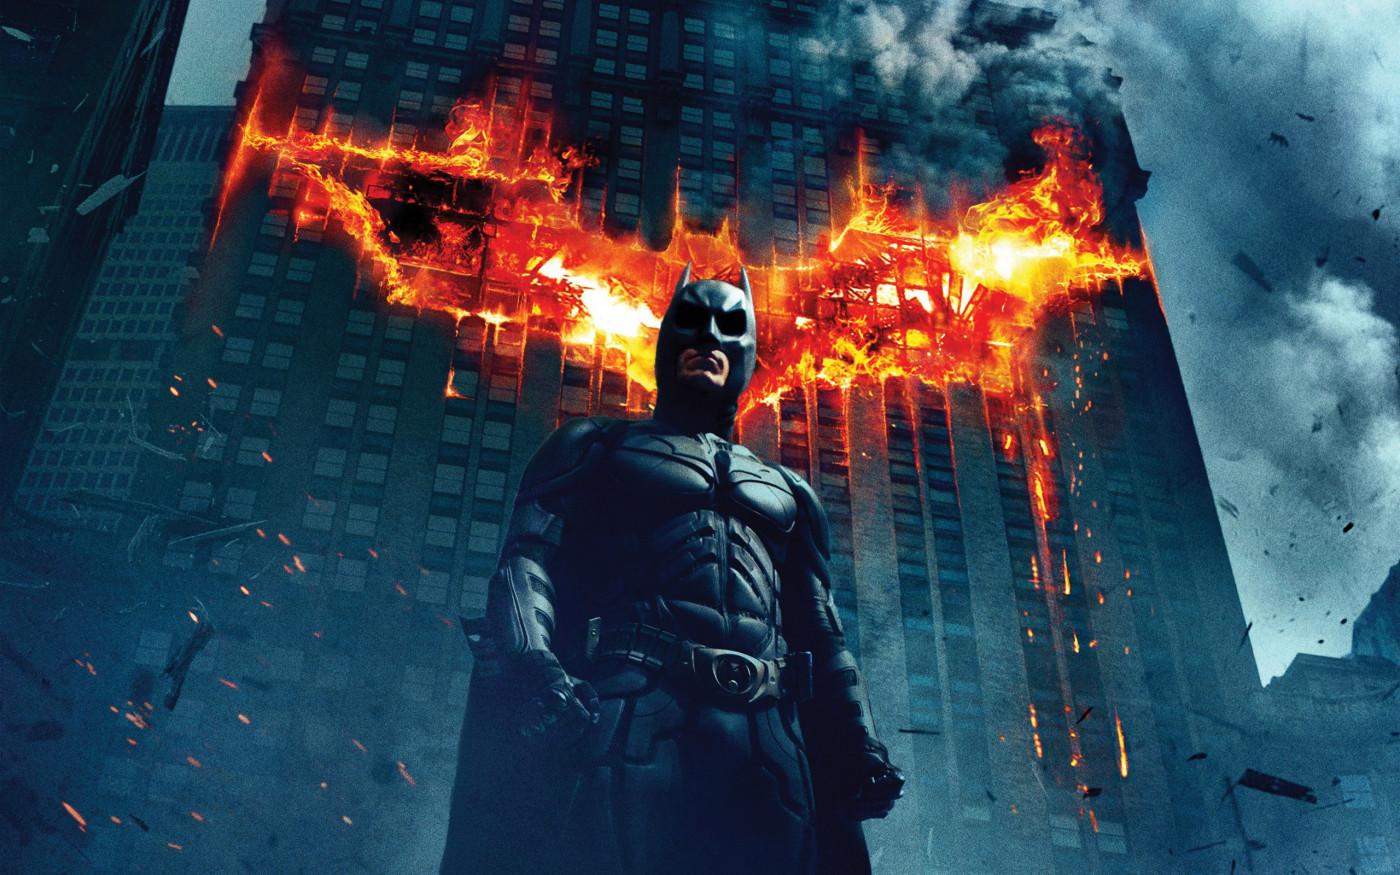 4. Batman: El caballero oscuro (2008)